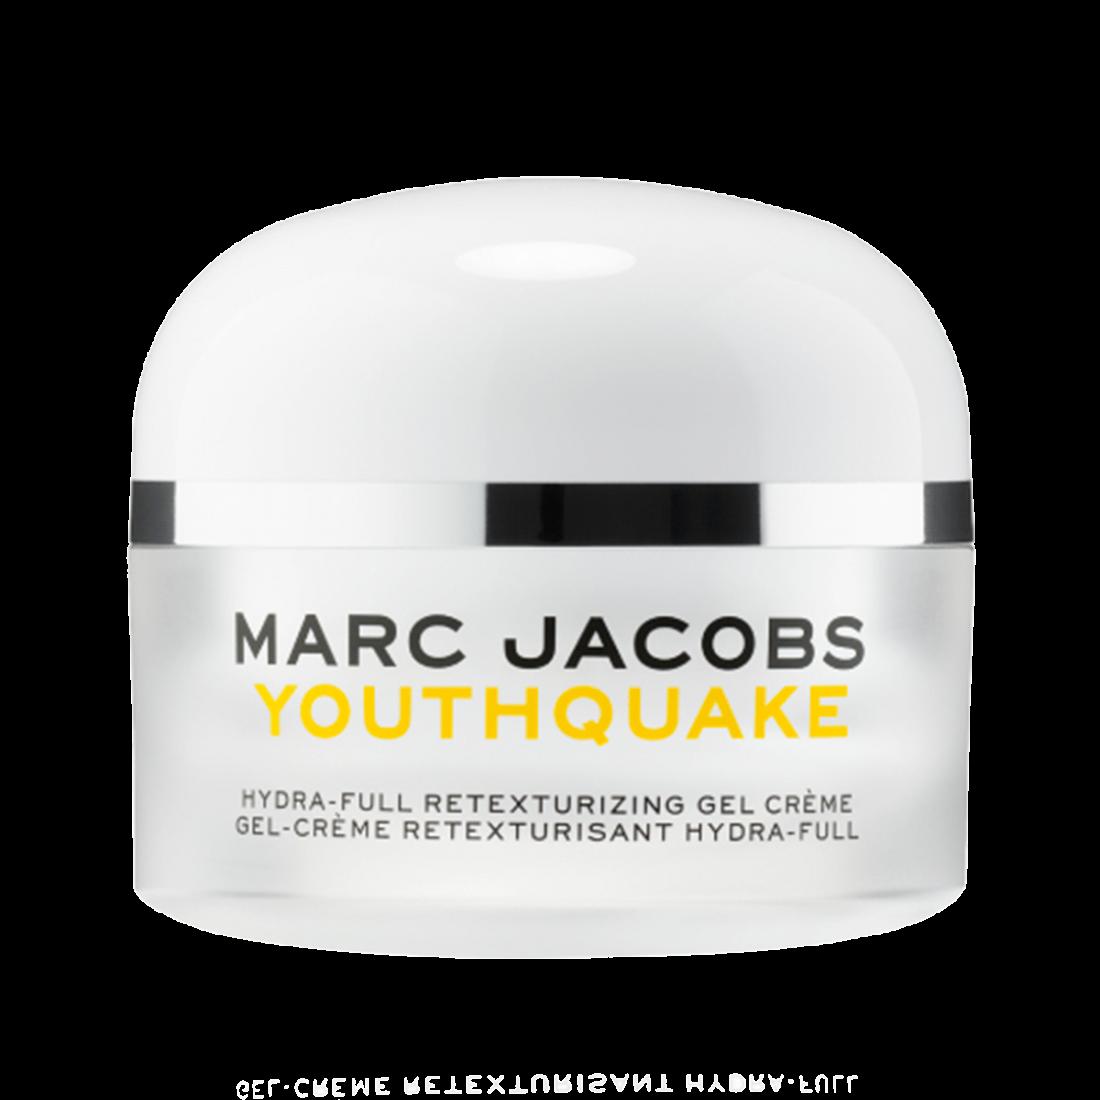 Marc Jacobs Youthquake Hydra-Full Retexturizing Gel Crème